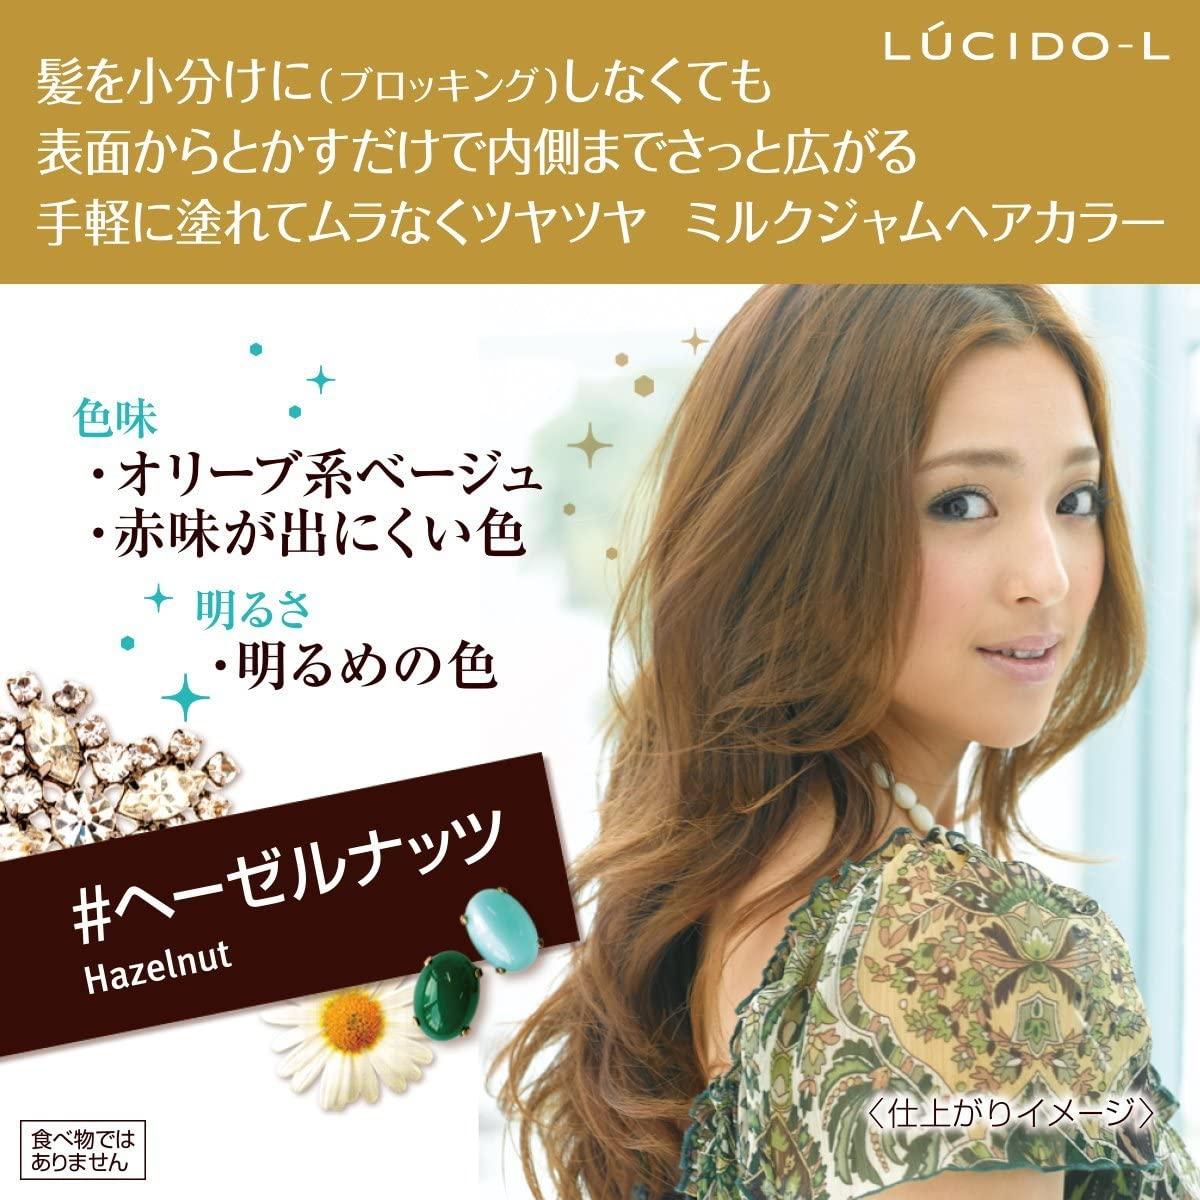 LUCIDO-L(ルシードエル) ミルクジャムヘアカラーの商品画像4